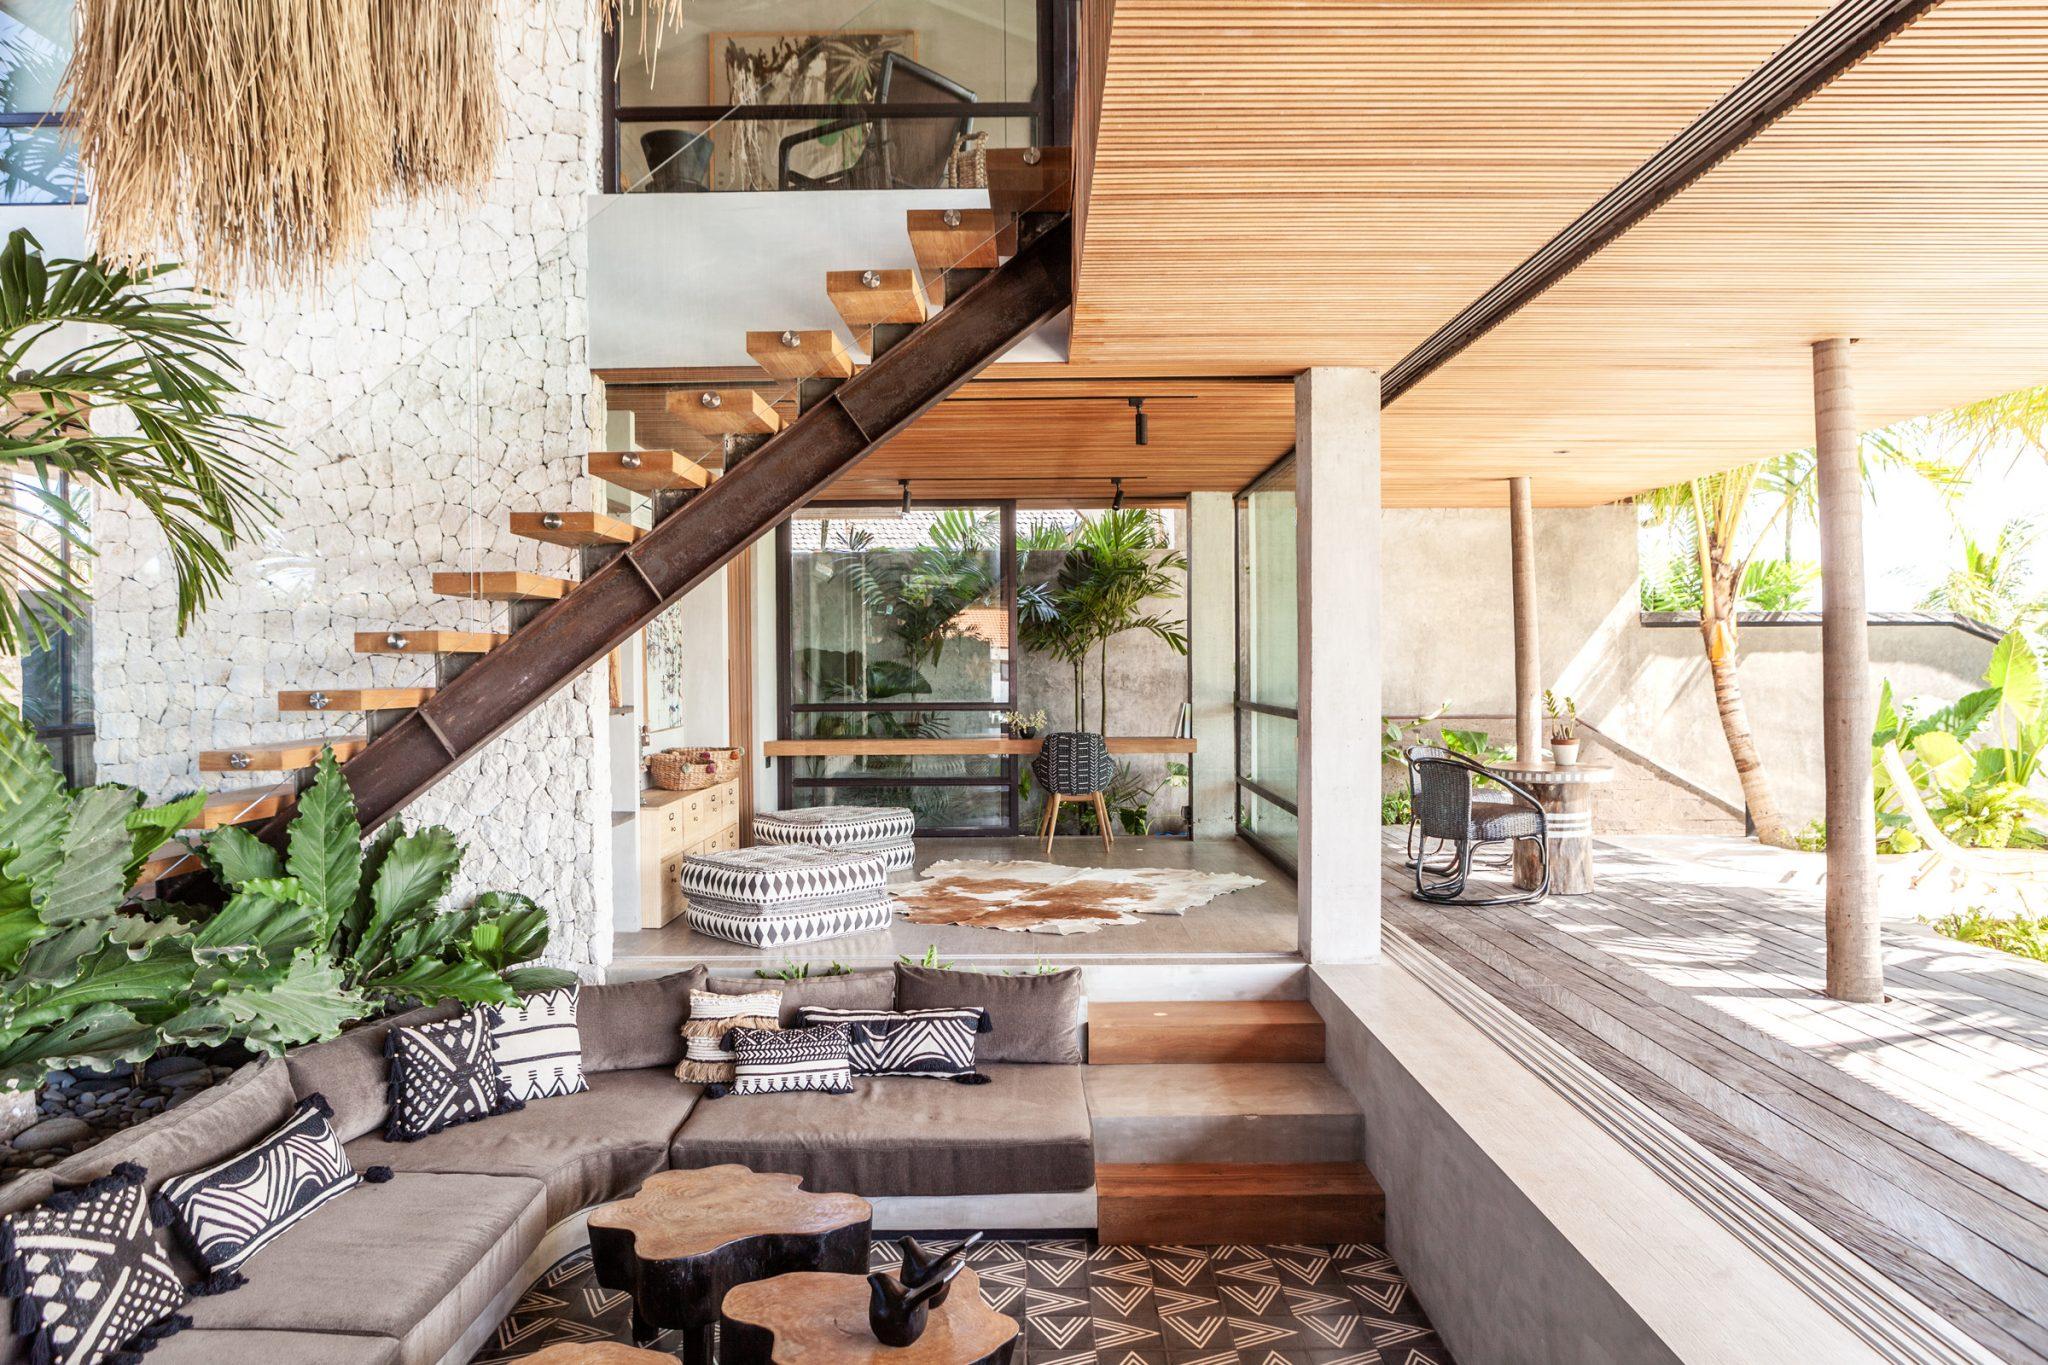 Bali Interiors- Cala Saona